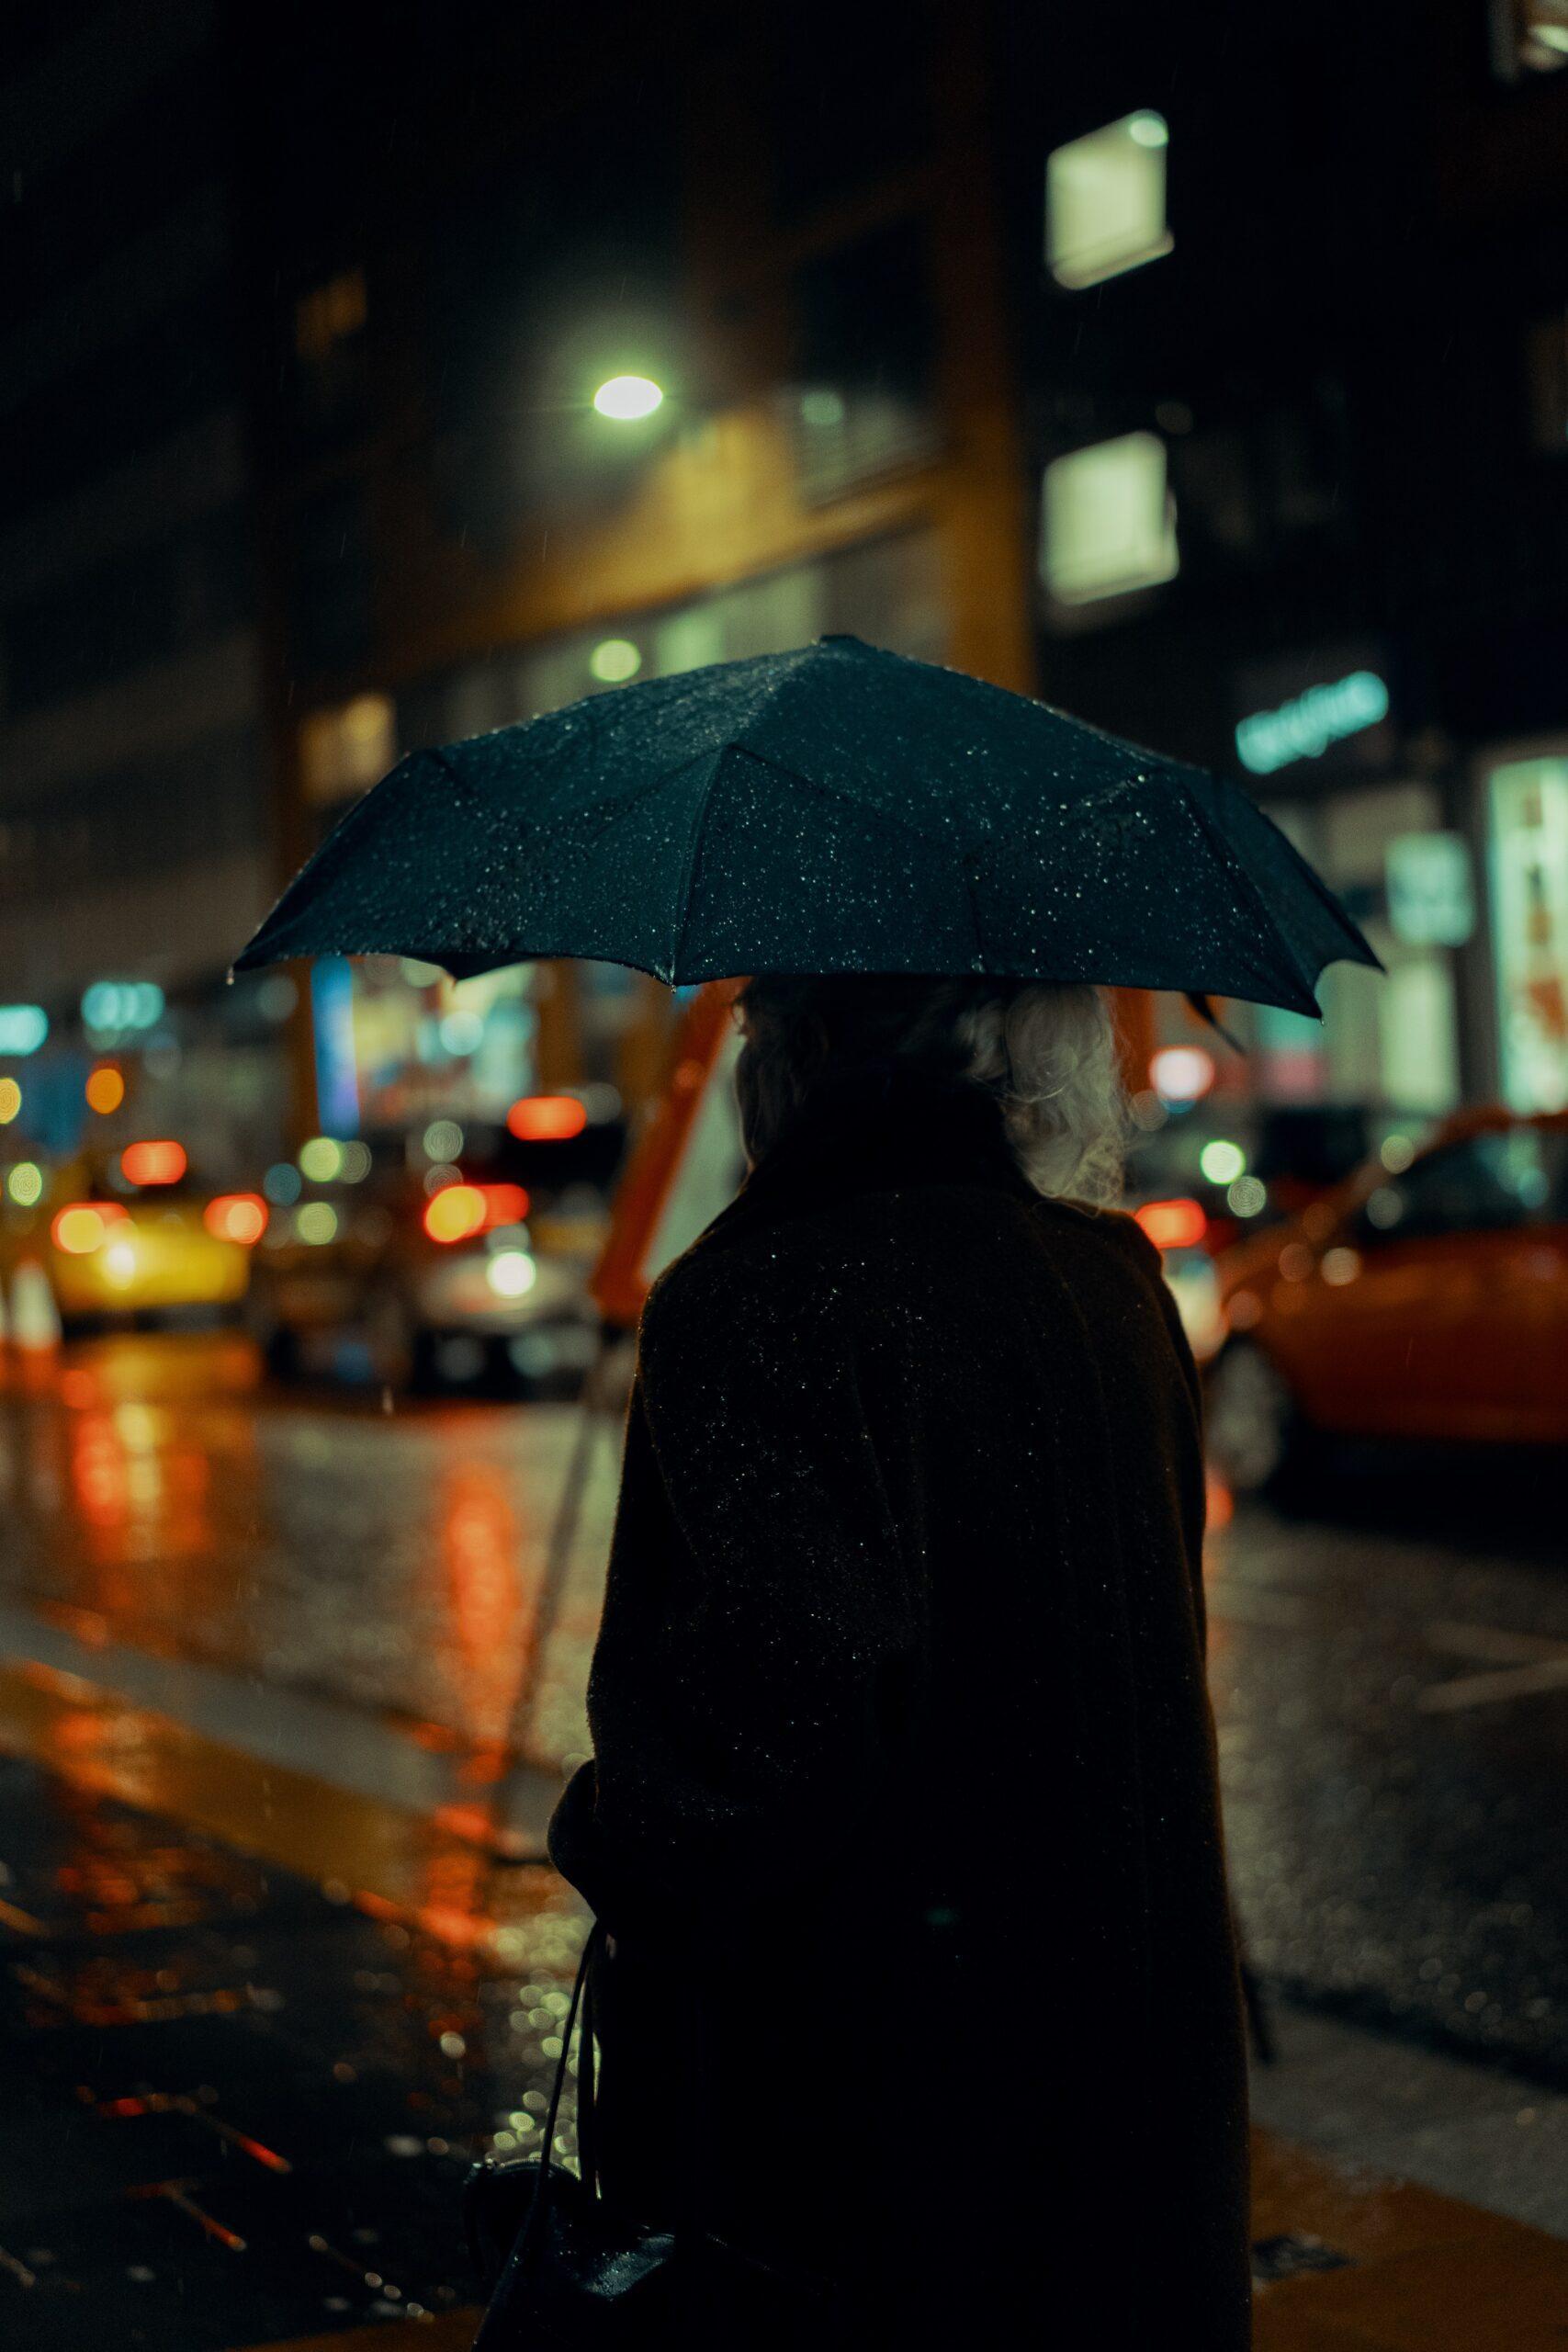 ross-sneddon-man with black umbrella in the rain NYC-unsplash (1)